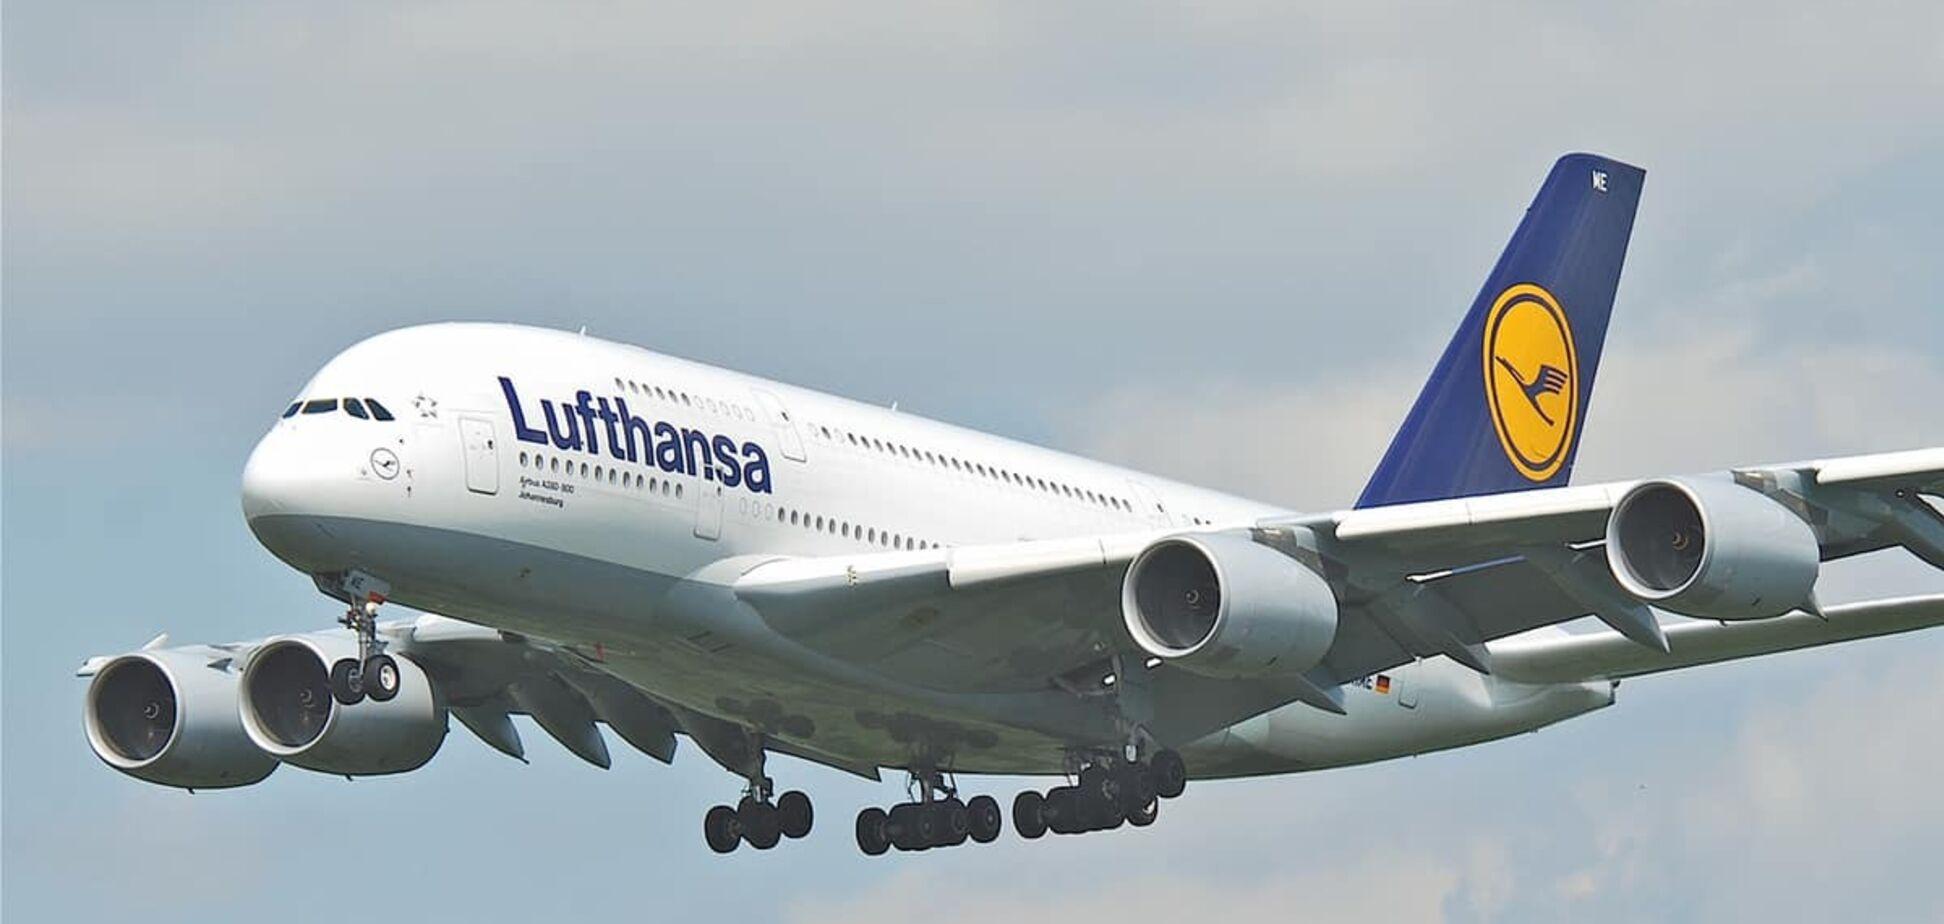 Поменять билет Lufthansa можно без штрафа